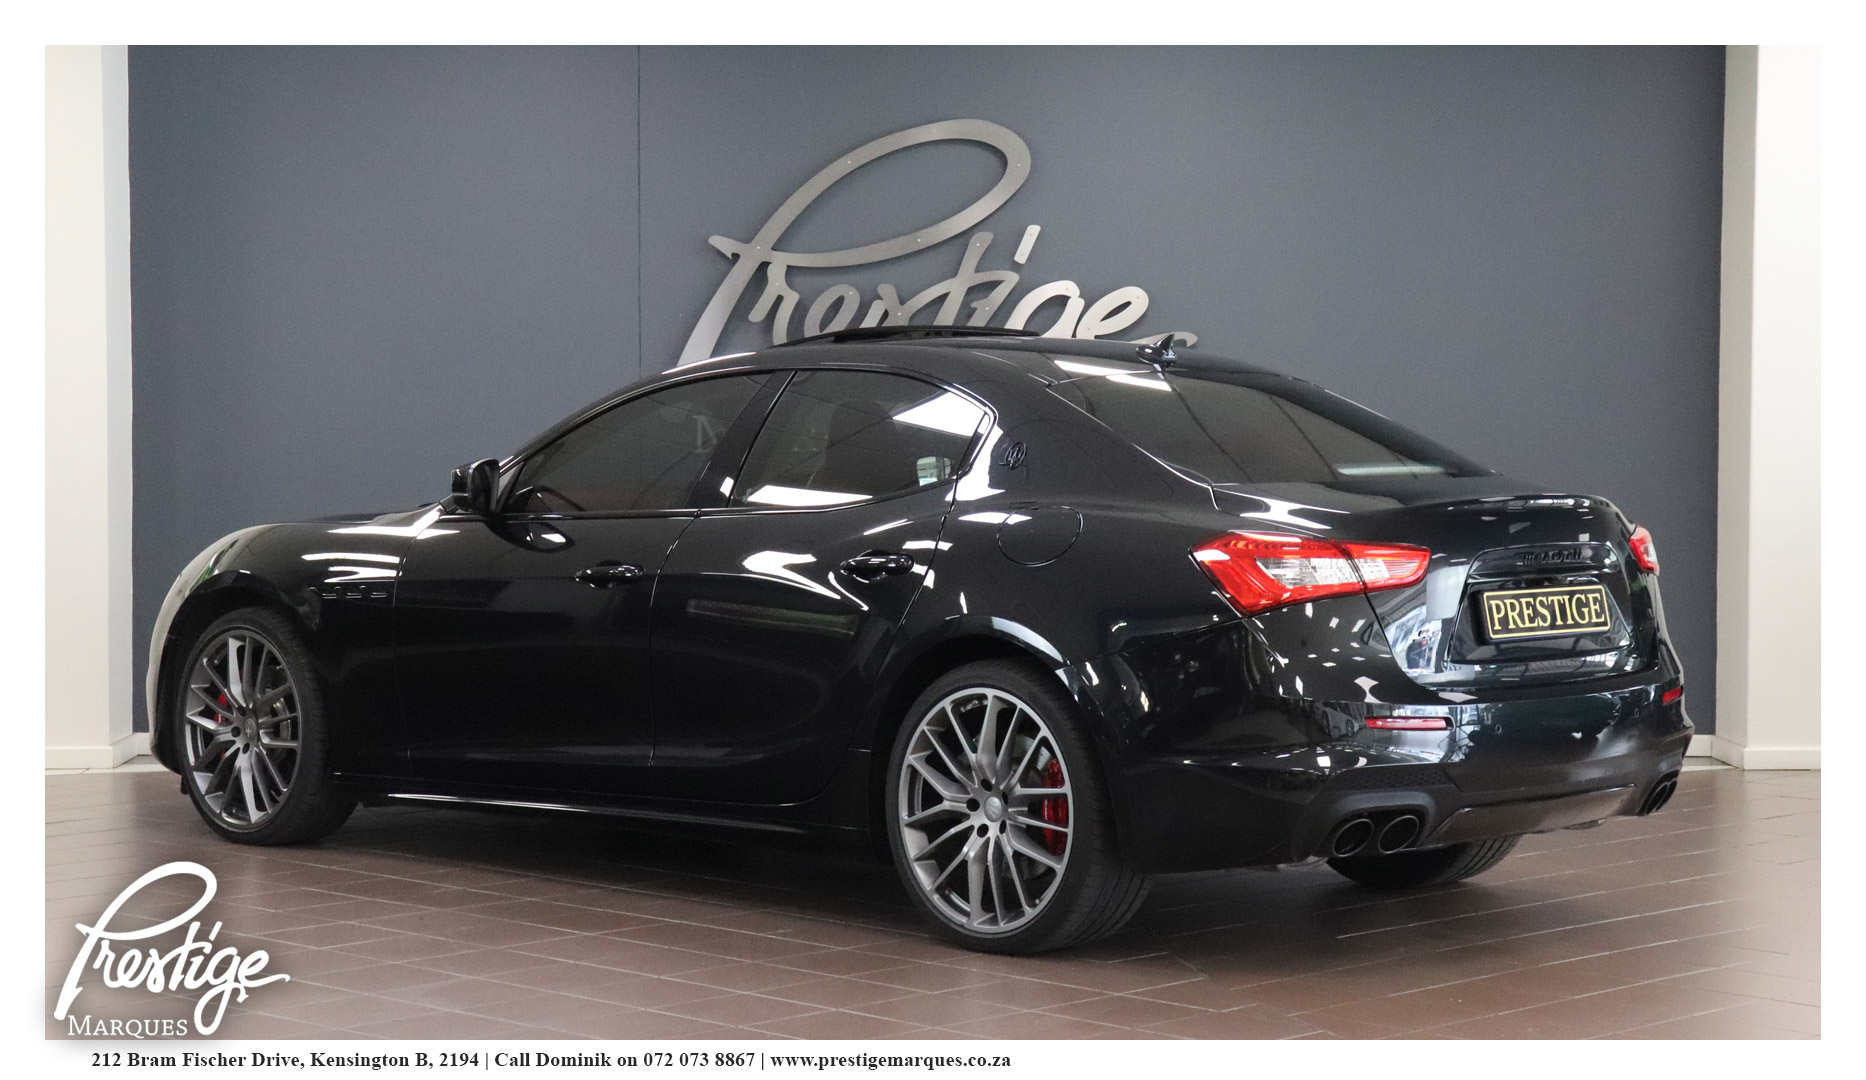 2018-Maserati-Ghibli-S-Grandsport-Prestige-Marques-Randburg-Sandton-5